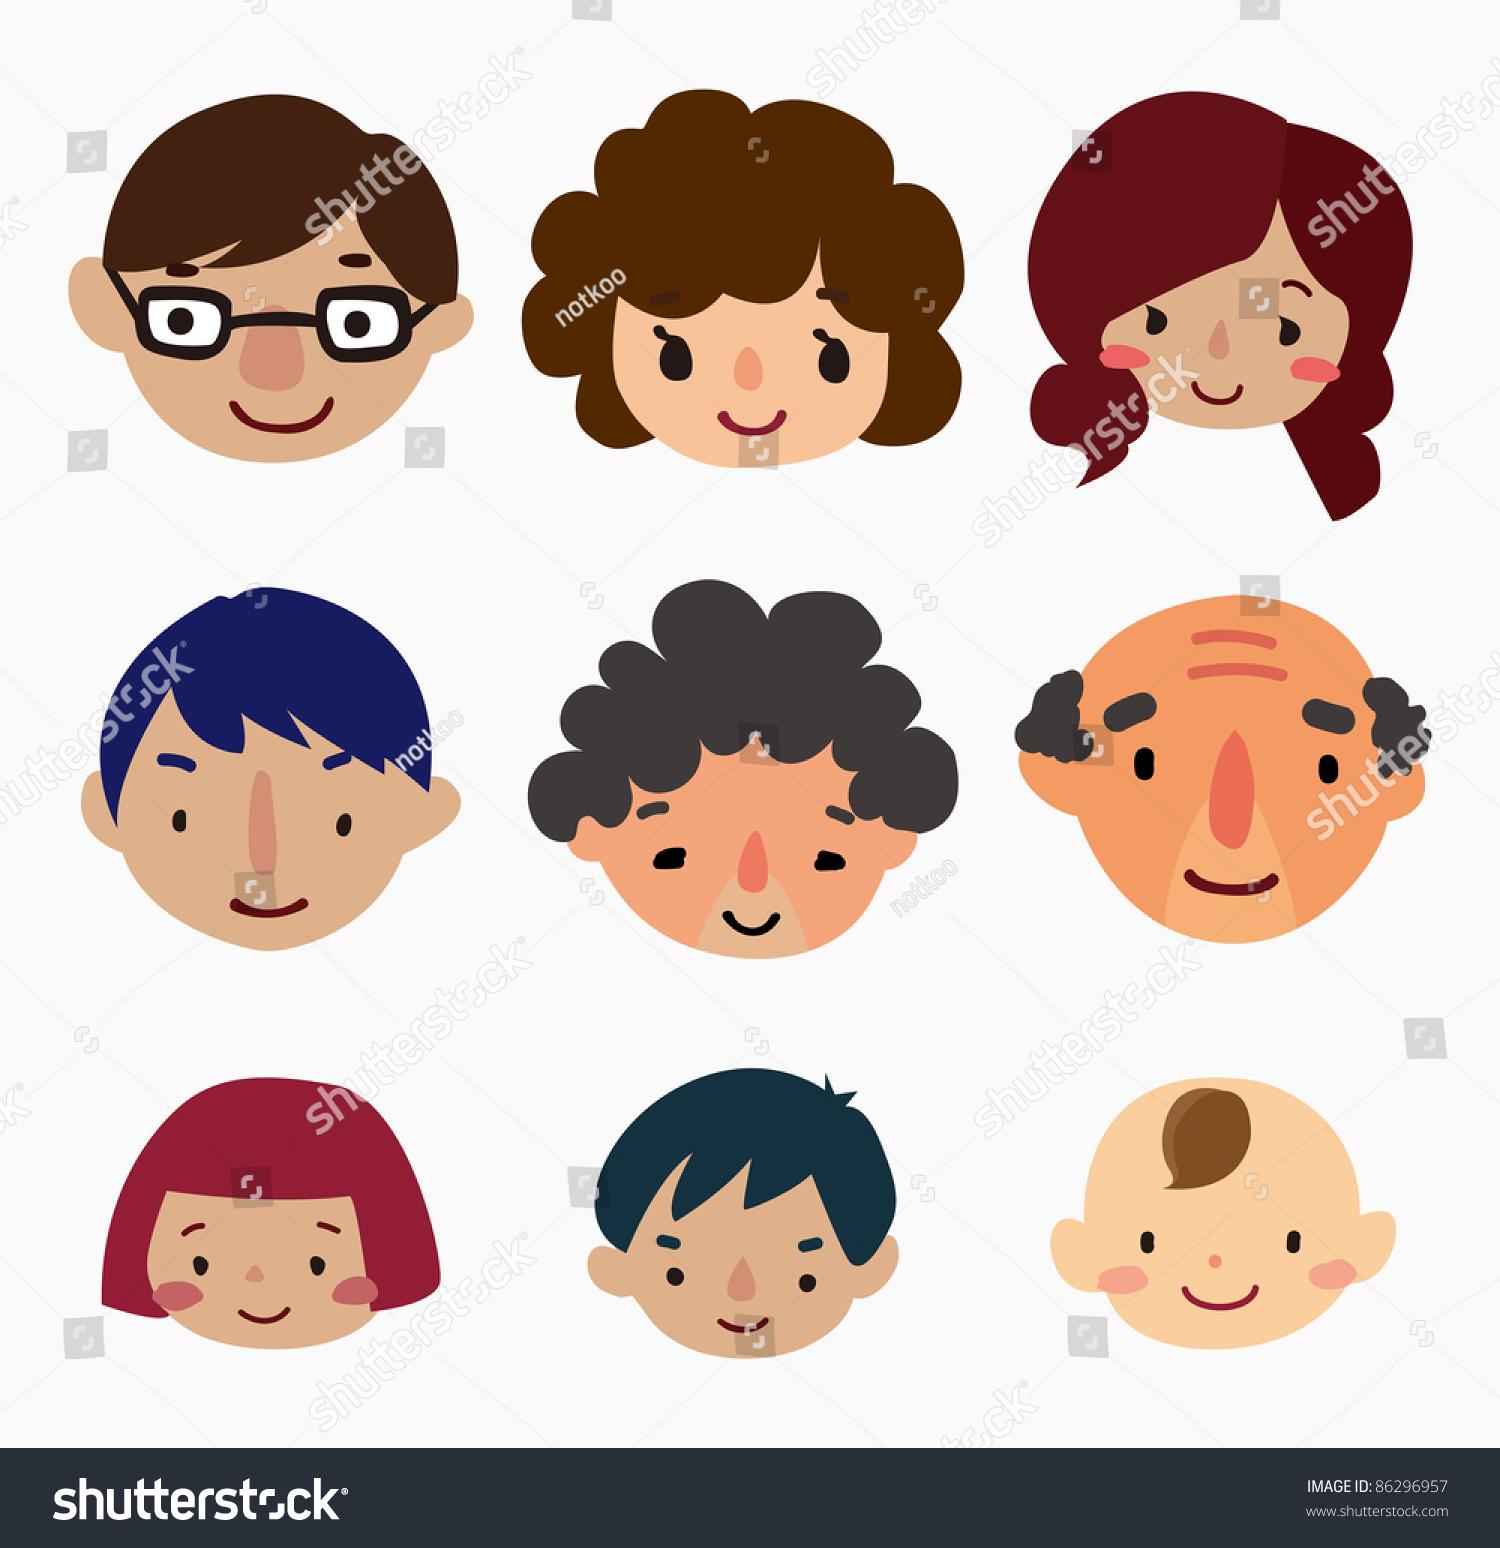 Cartoon Family Face Icons Stock Vector 86296957  Shutterstock